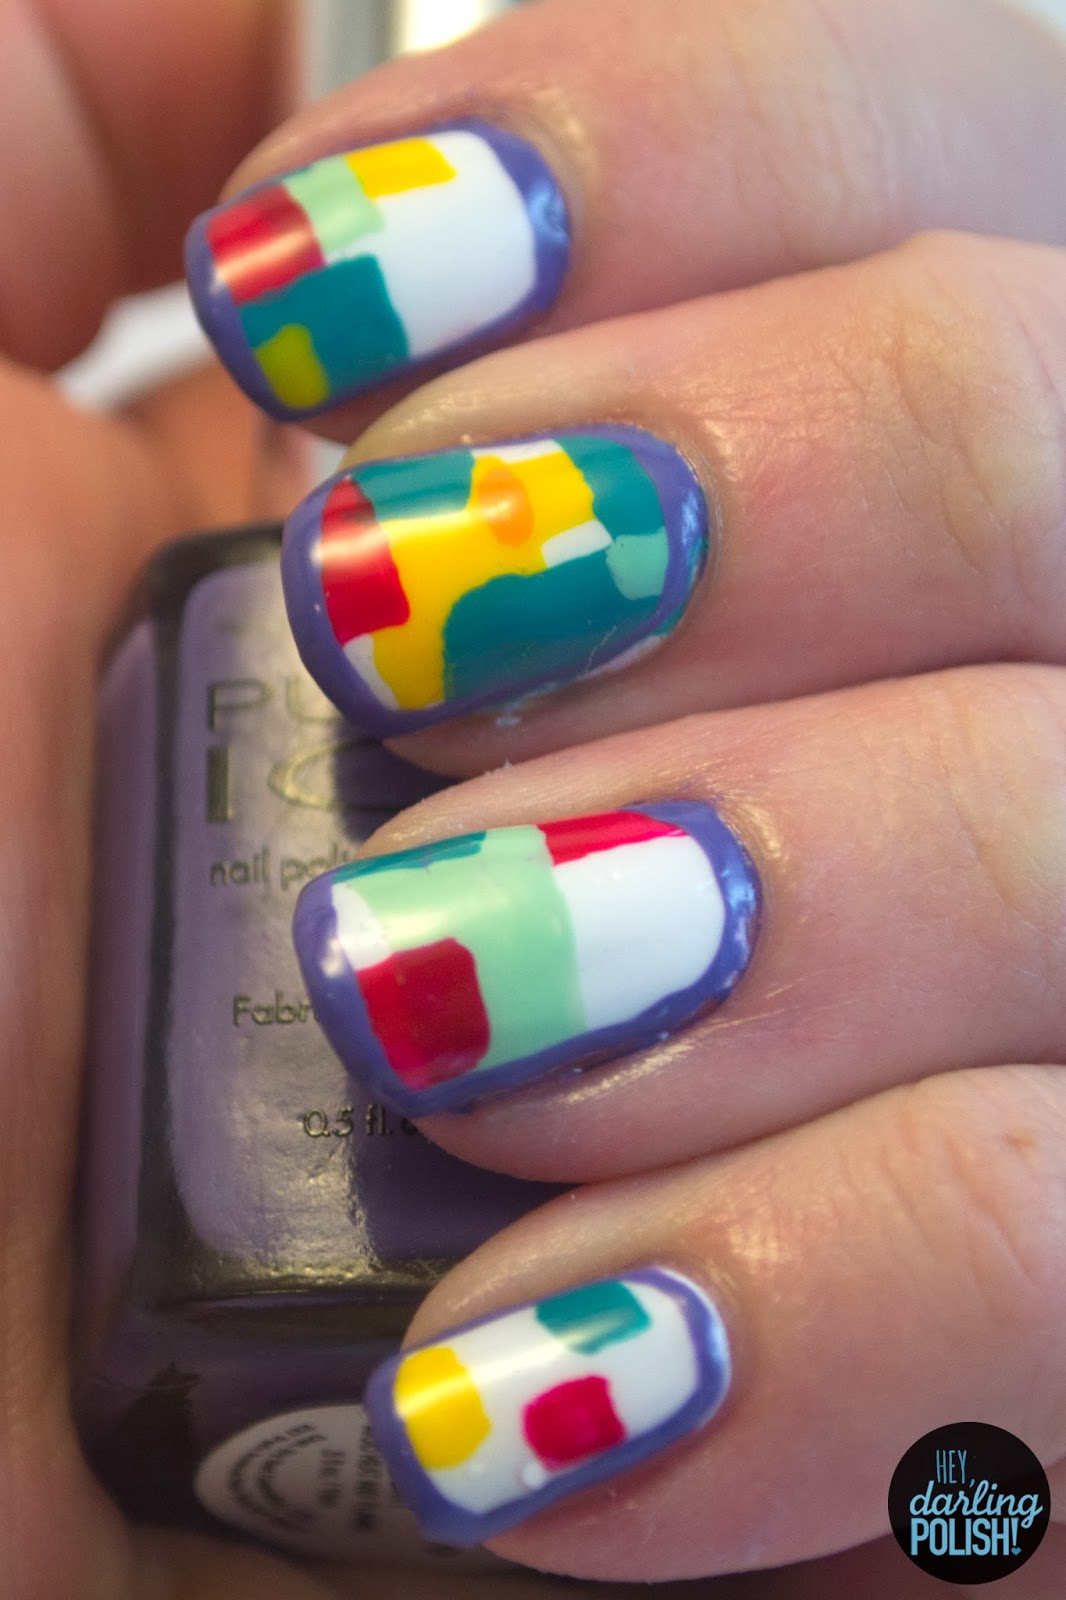 nails, nail polish, nail art, we are the in crowd, guaranteed to disagree, hey darling polish, freehand, blocks, colorful, music monday